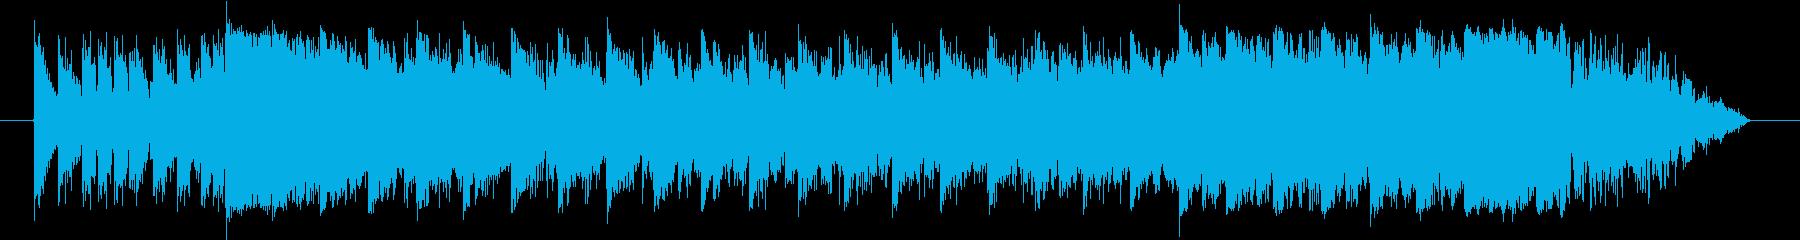 EDM ジングル CM スポット 15秒の再生済みの波形